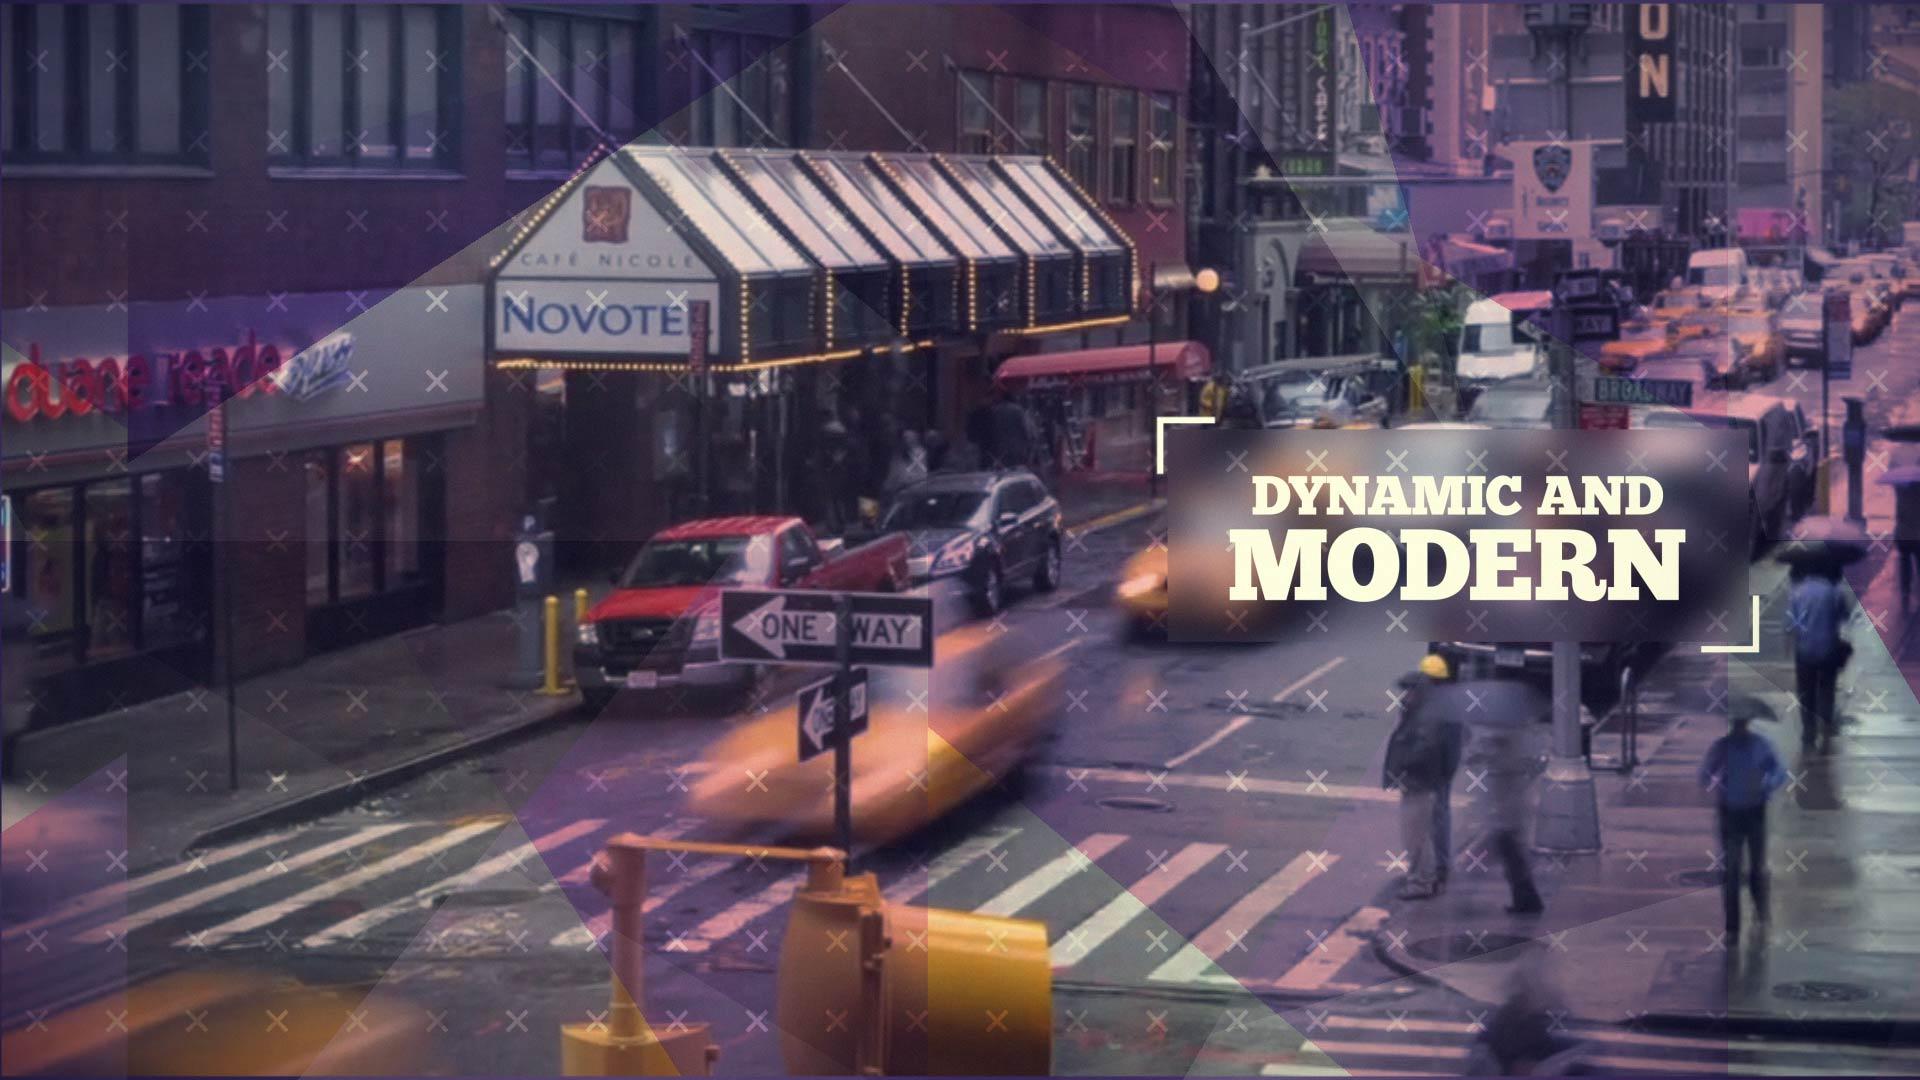 ساخت تیزر پروموی مدرن و دینامیک Trendy Dynamic Opener